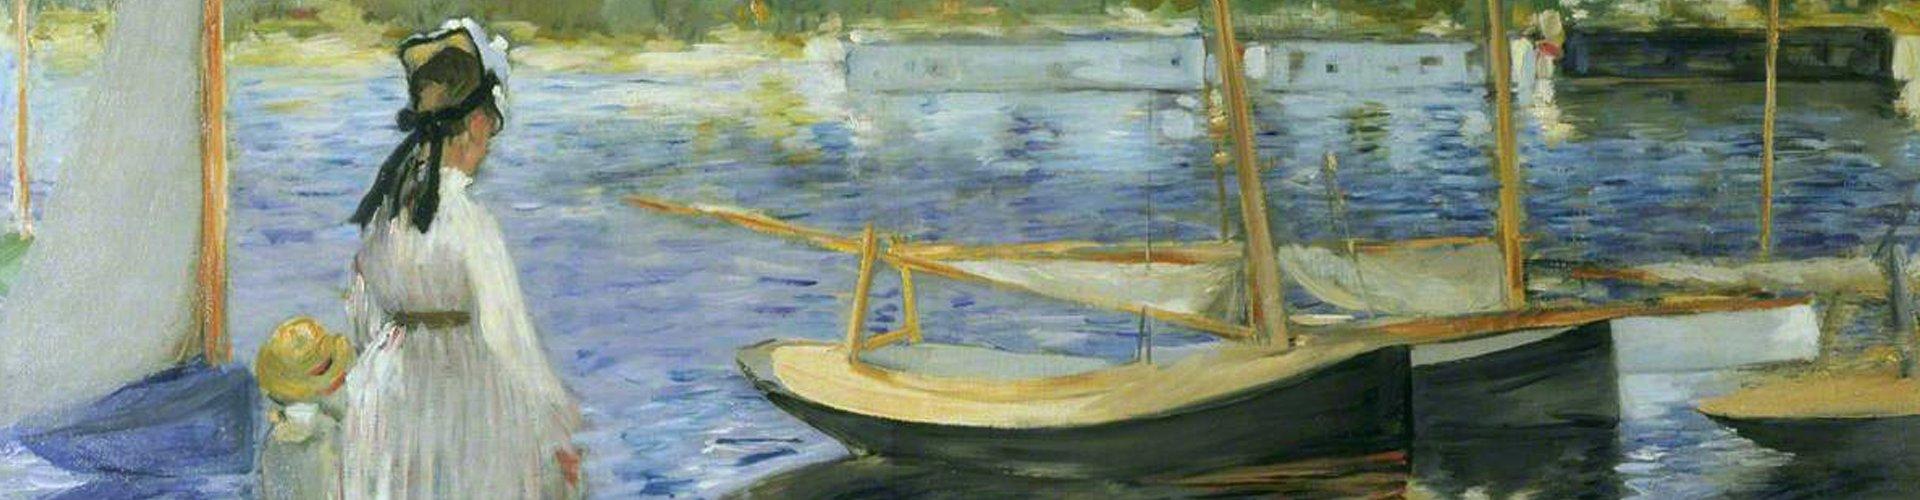 Manet, Monet en Morisot